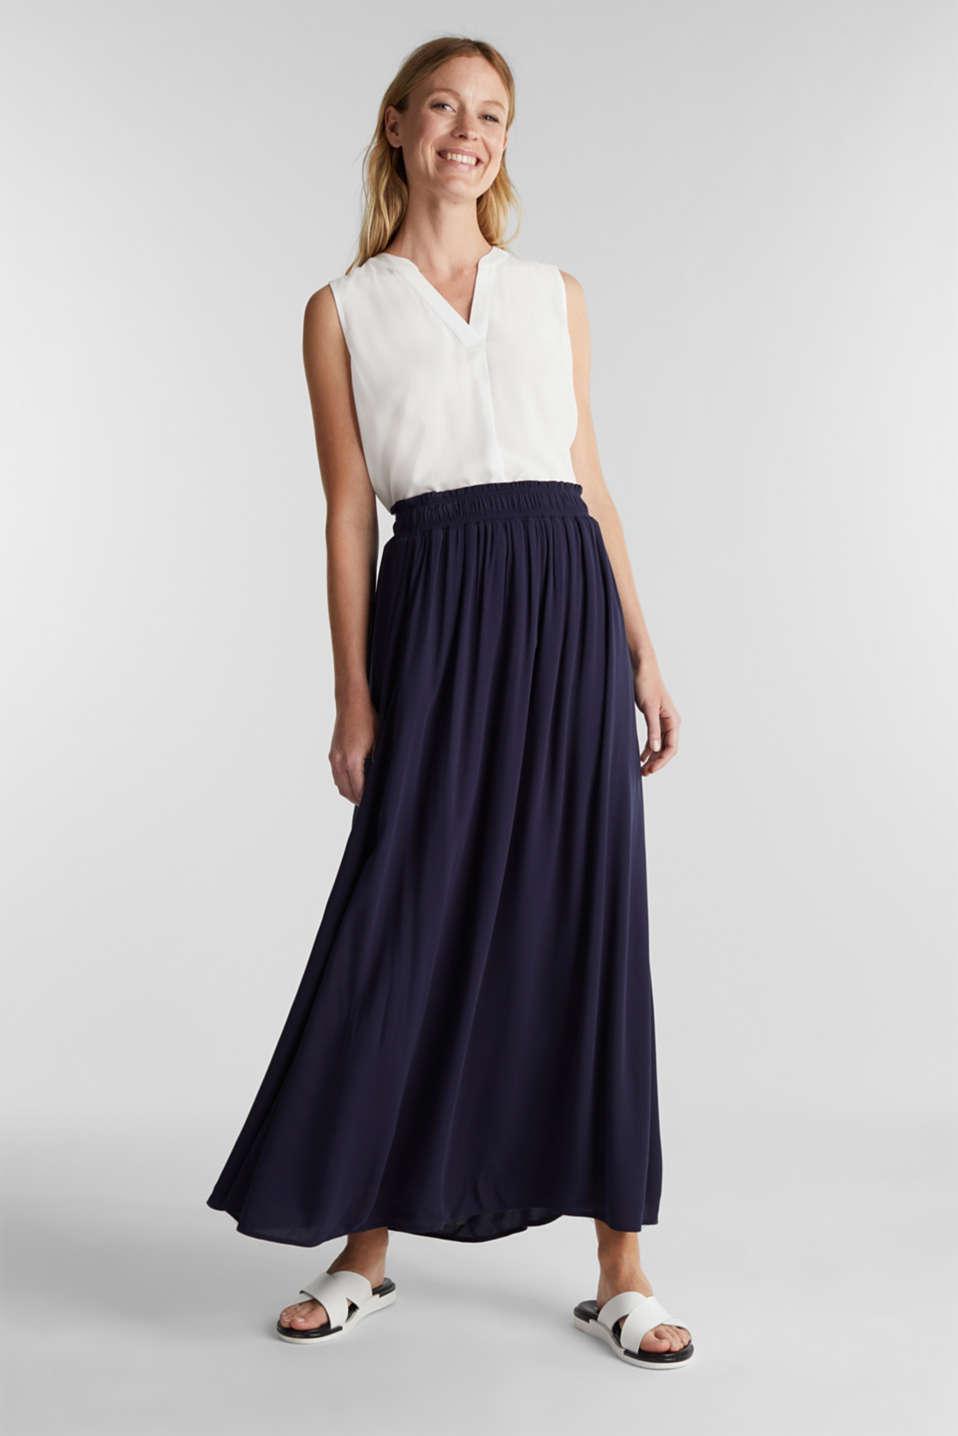 Maxi skirt in flowing crêpe, NAVY, detail image number 1